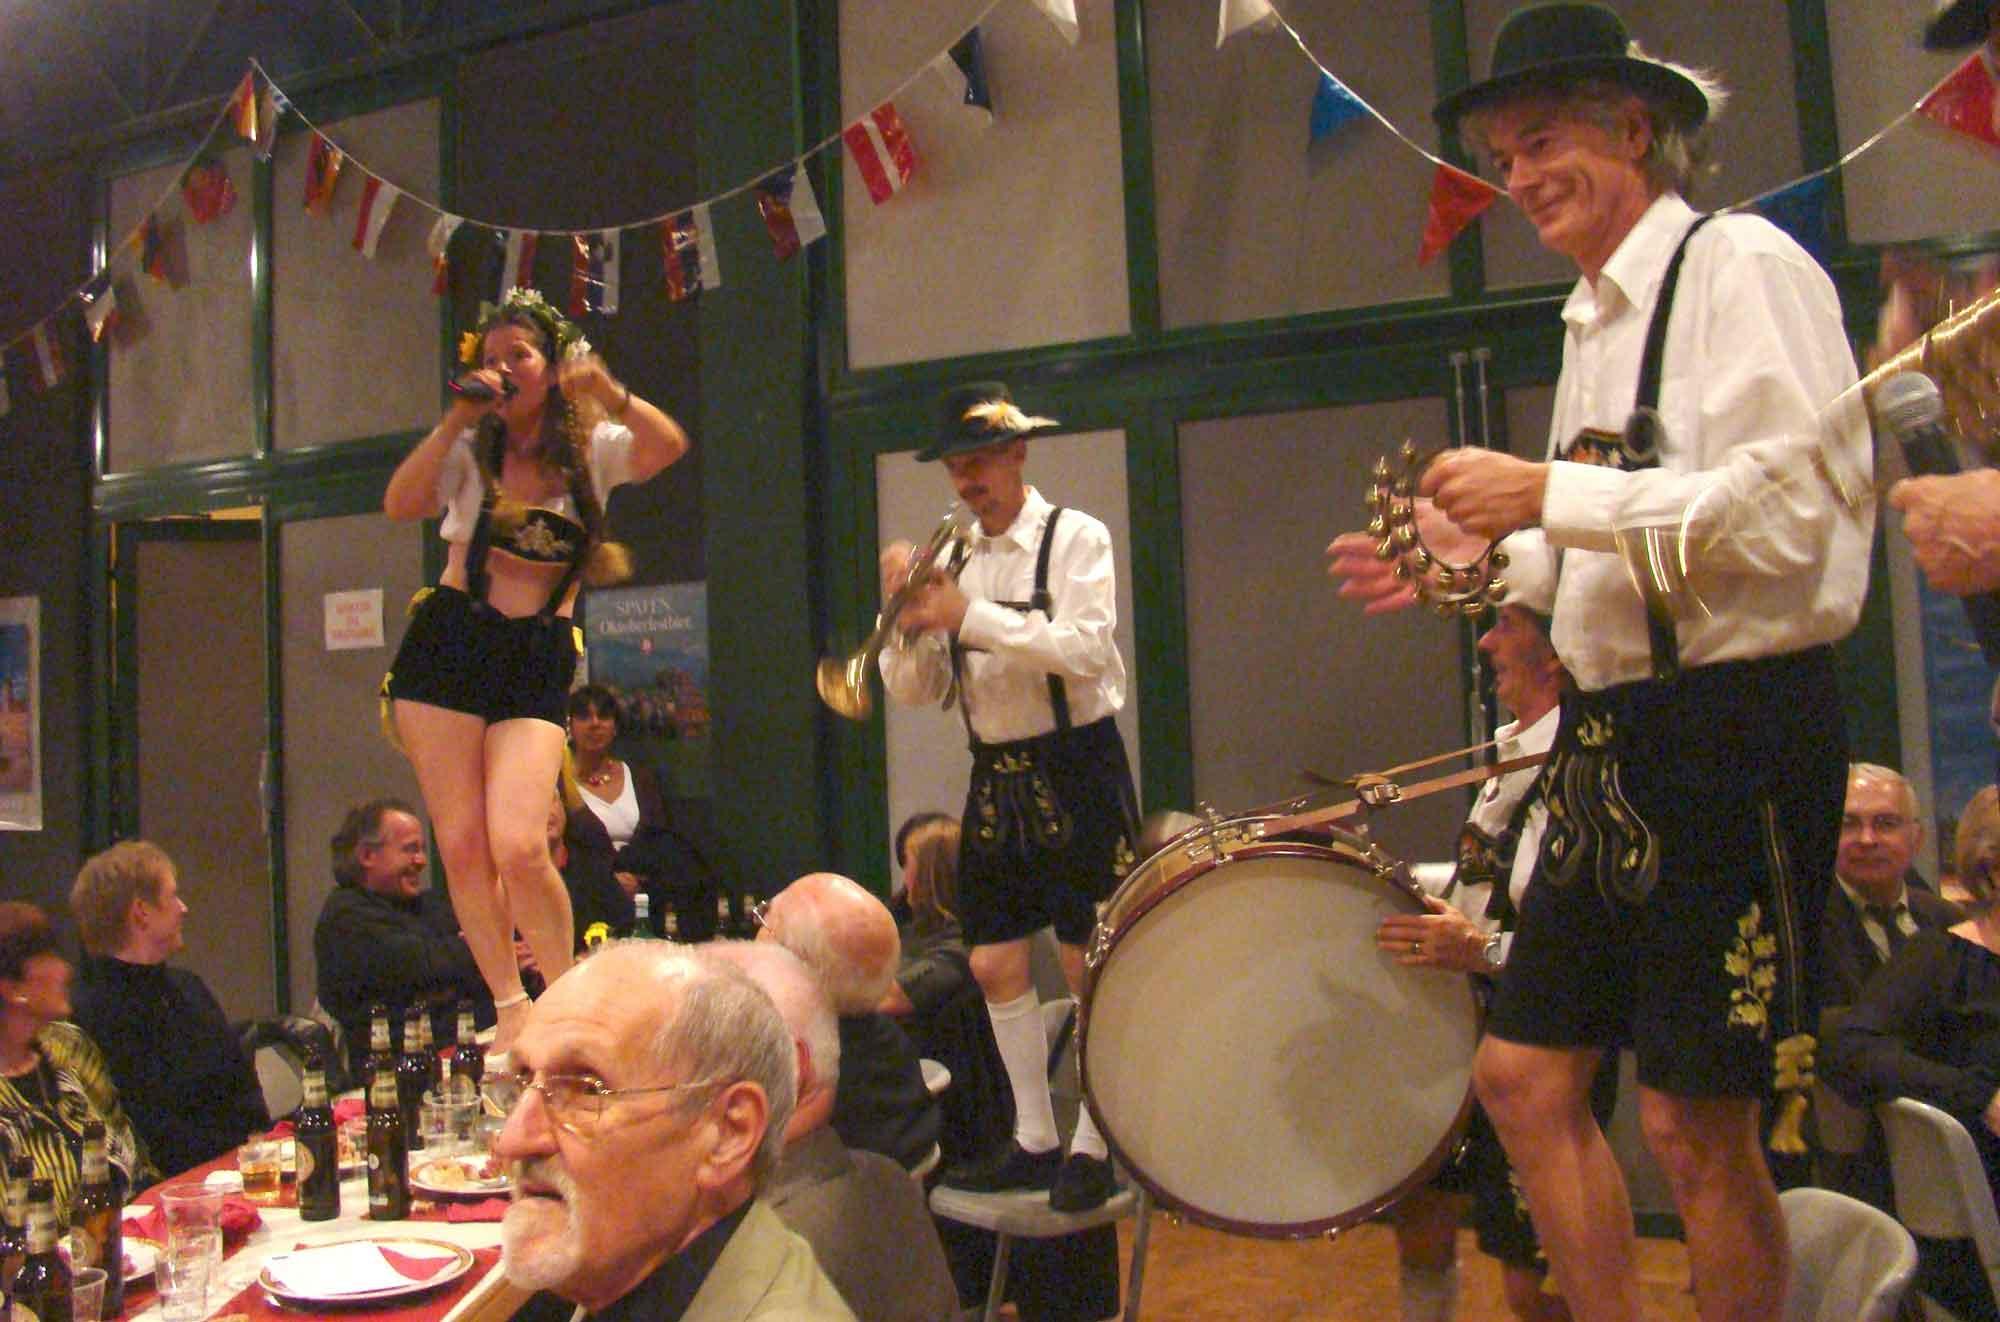 2 orchestre bavarois et de variété Gallisch Brezel, Andresy 78 2009